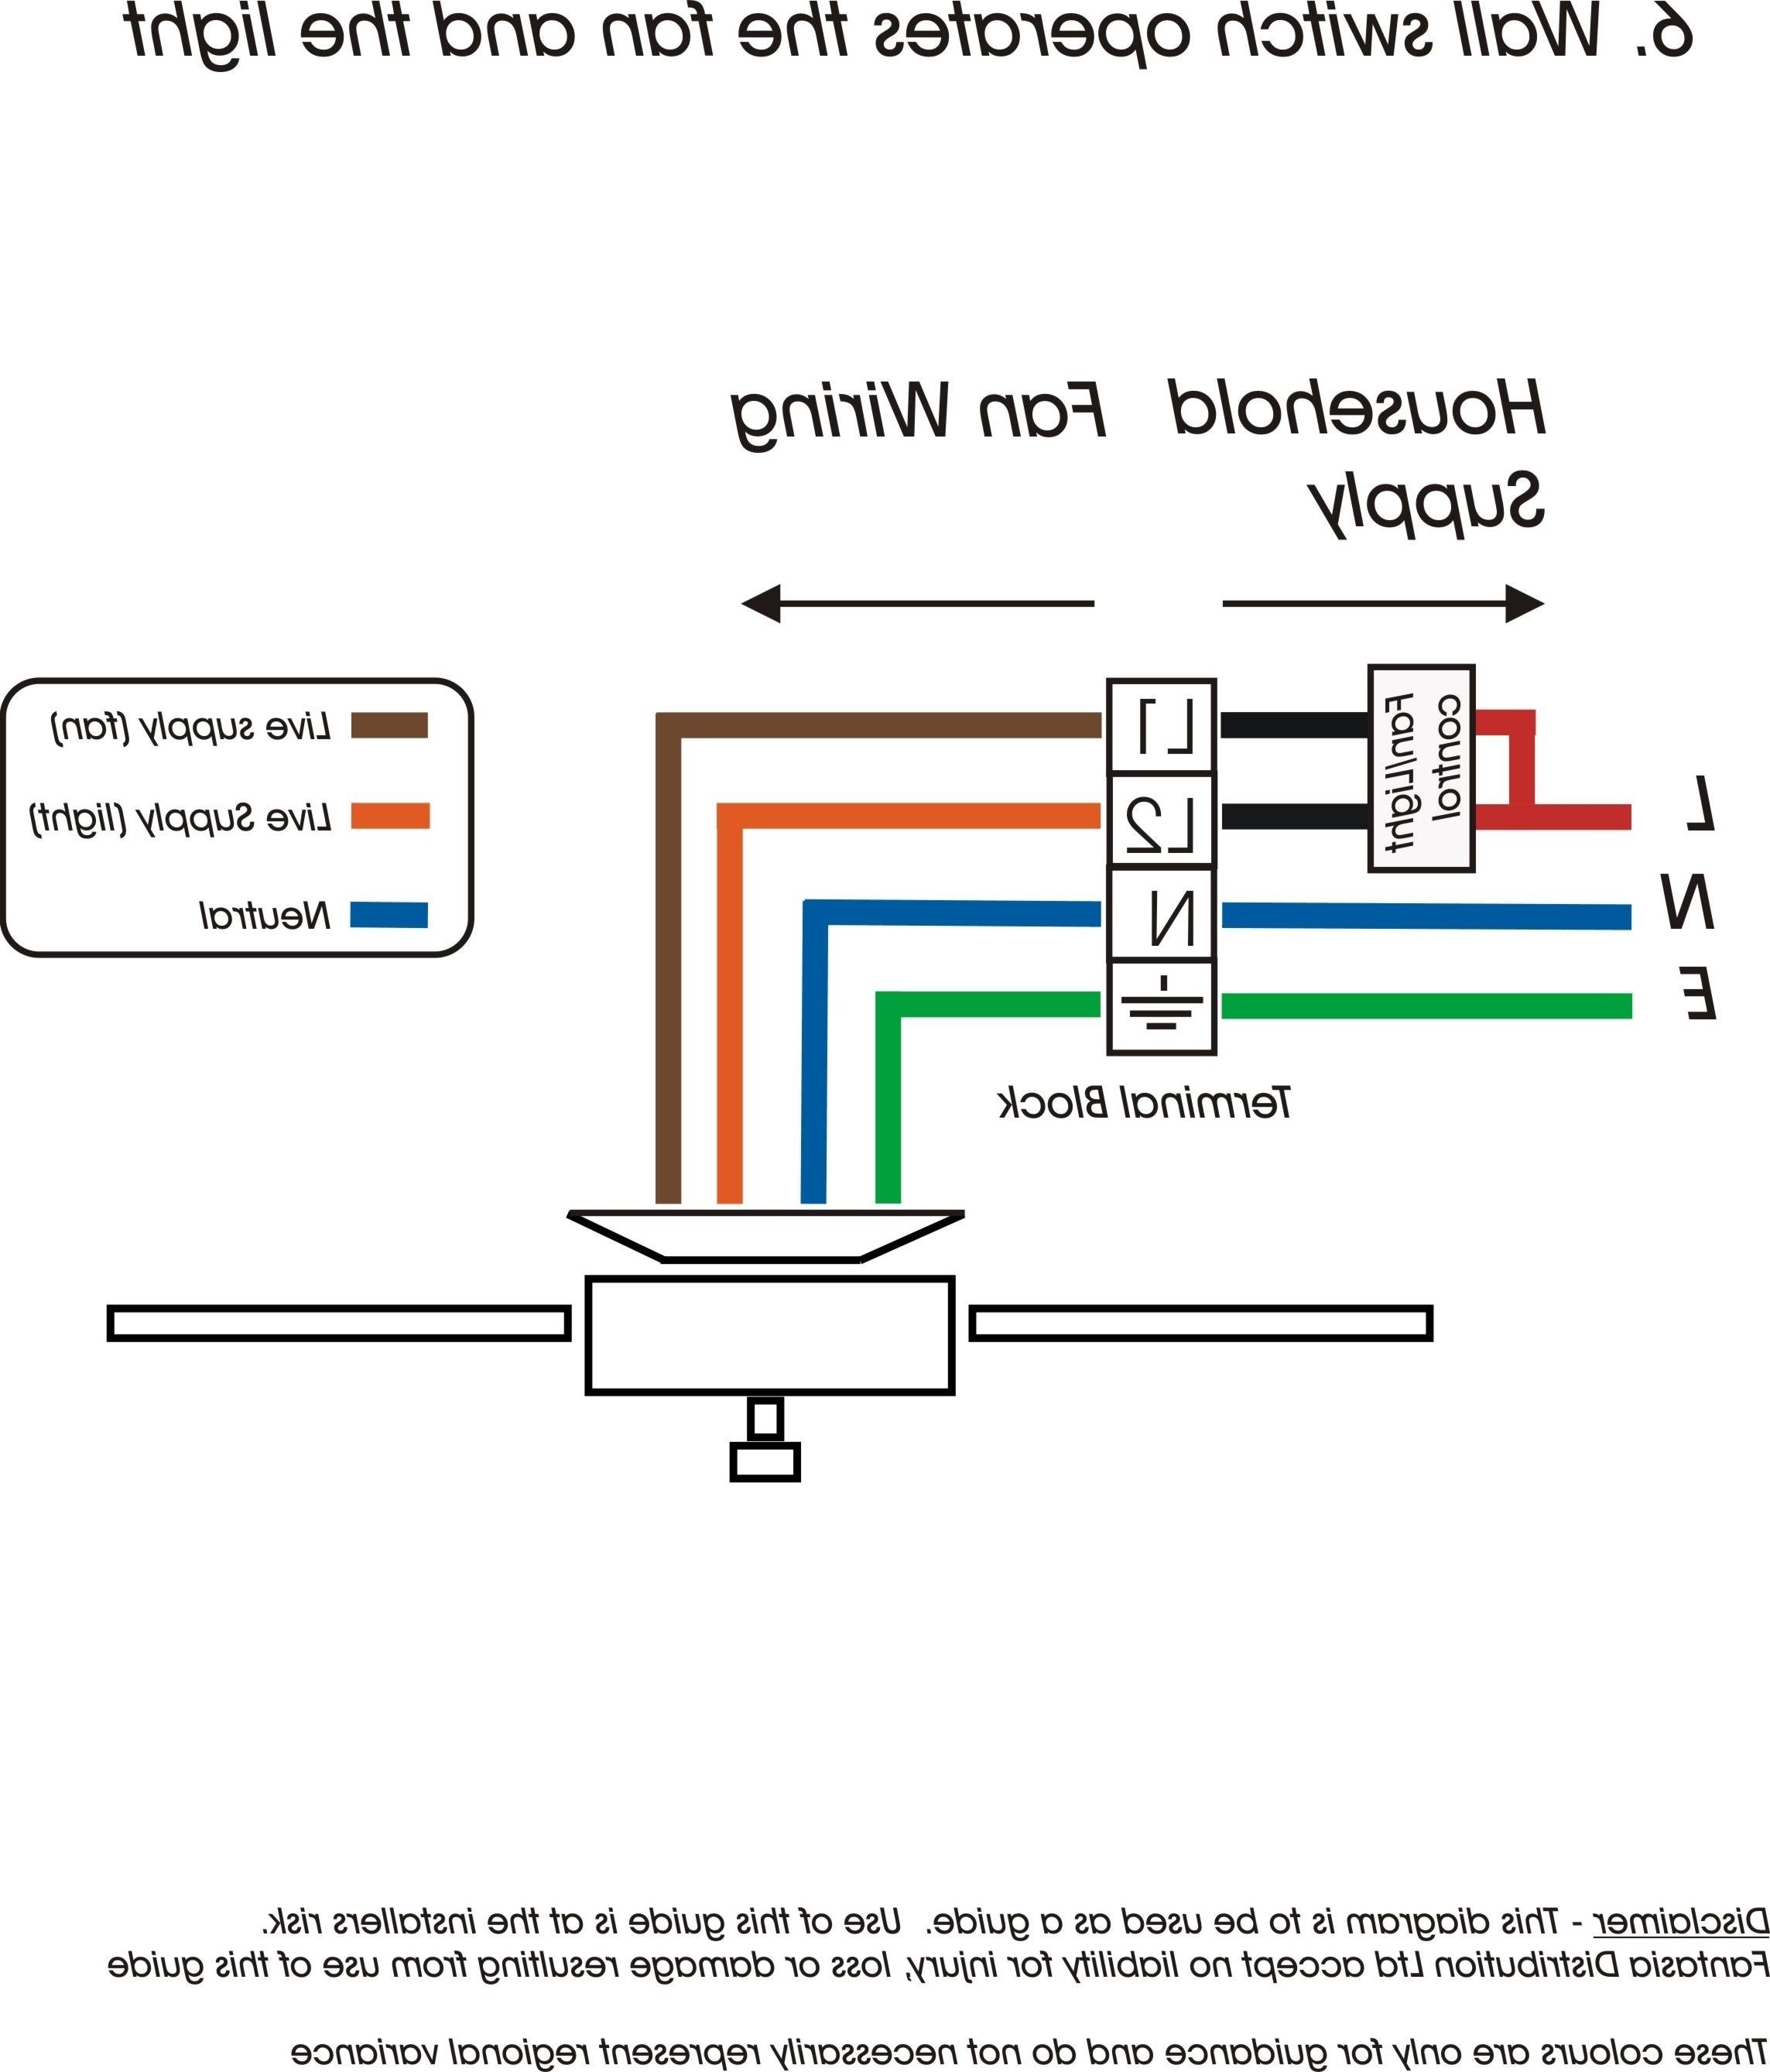 black magic fan wiring diagram Download-black magic fan wiring diagram Download wiring ceiling lights diagram basic wiring ceiling light wiring 10-l